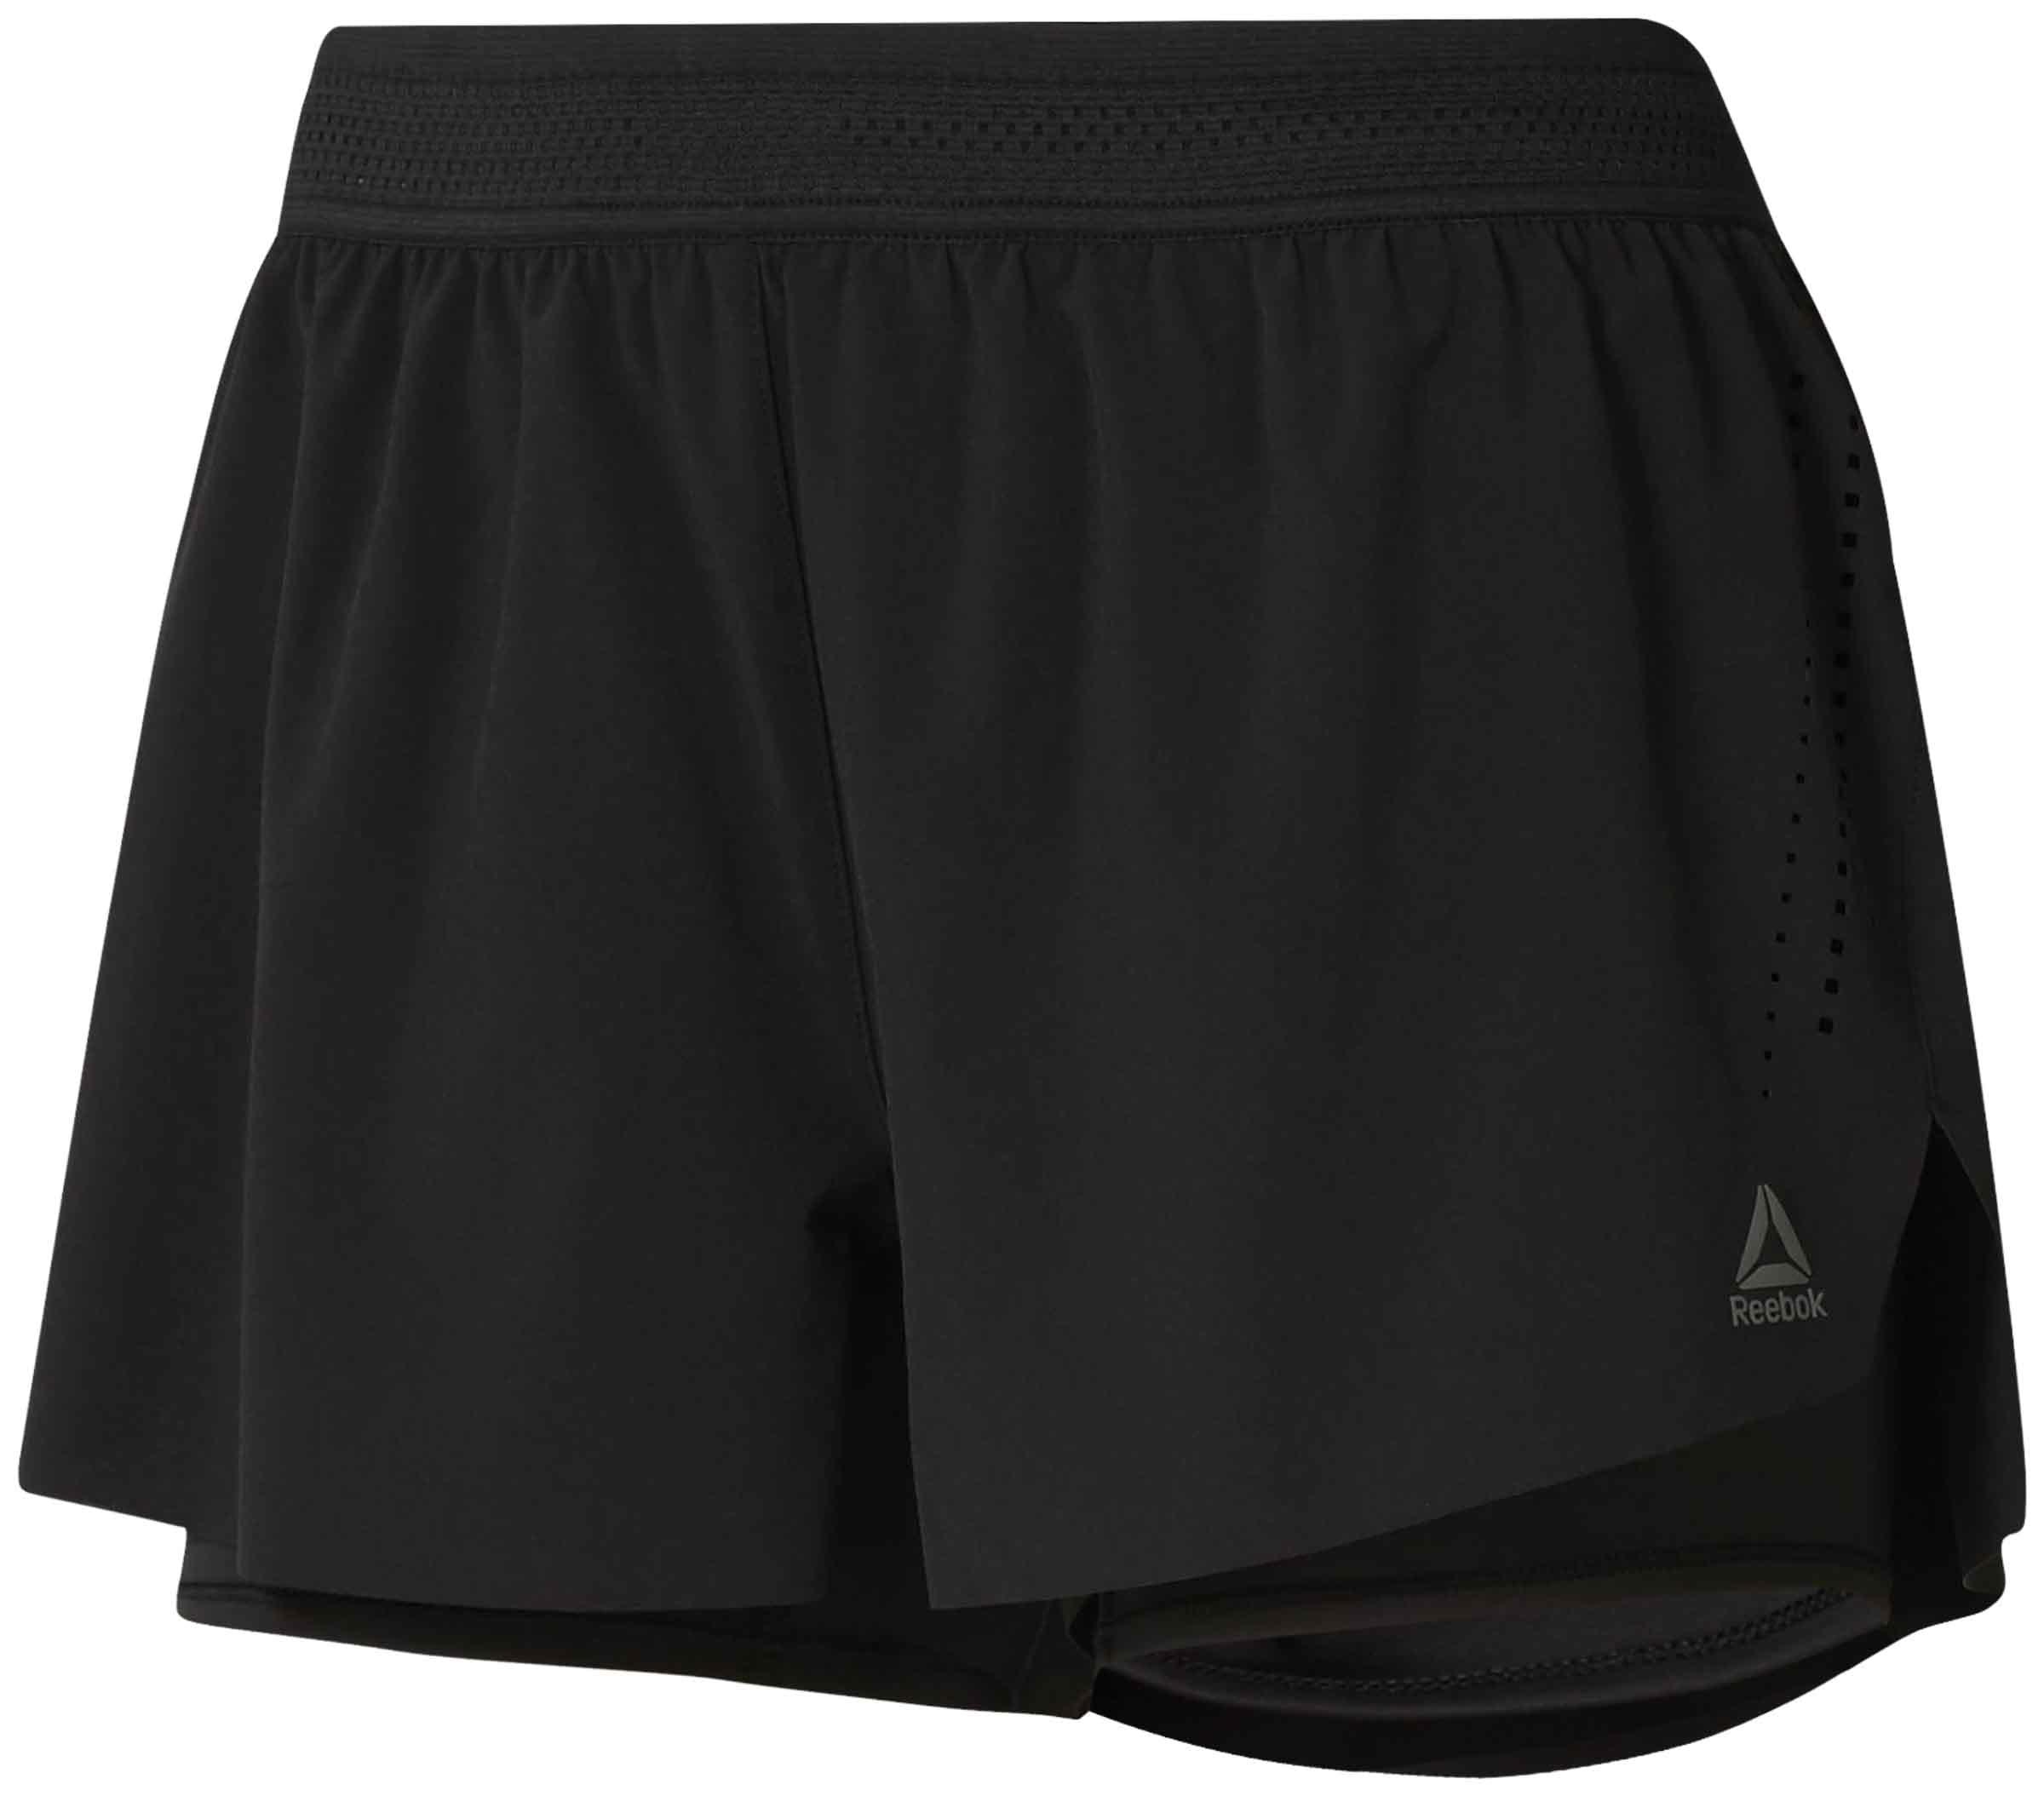 crossfit-shorts-epic-short